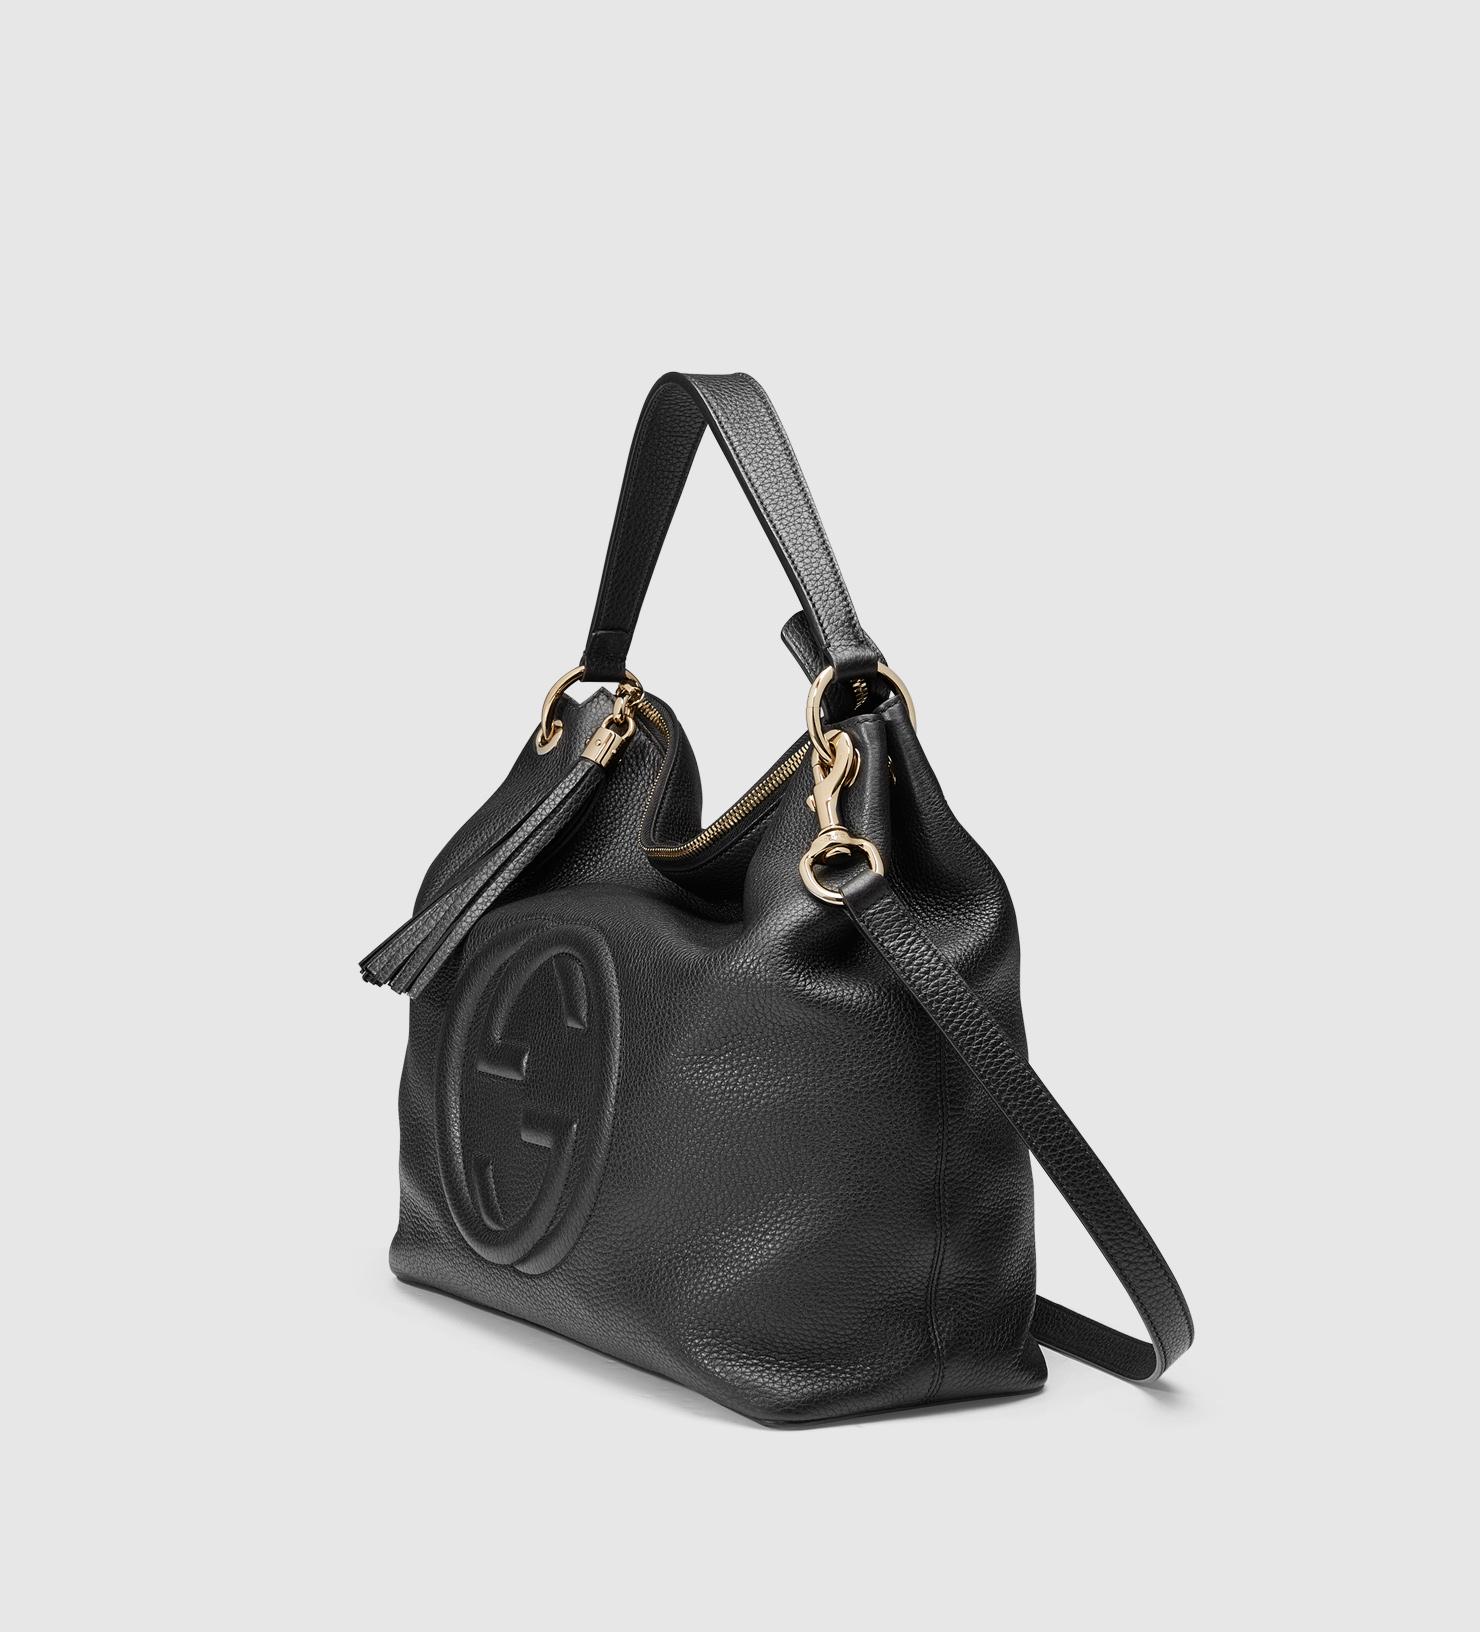 5775f9c40c37 Lyst - Gucci Soho Leather Hobo in Black